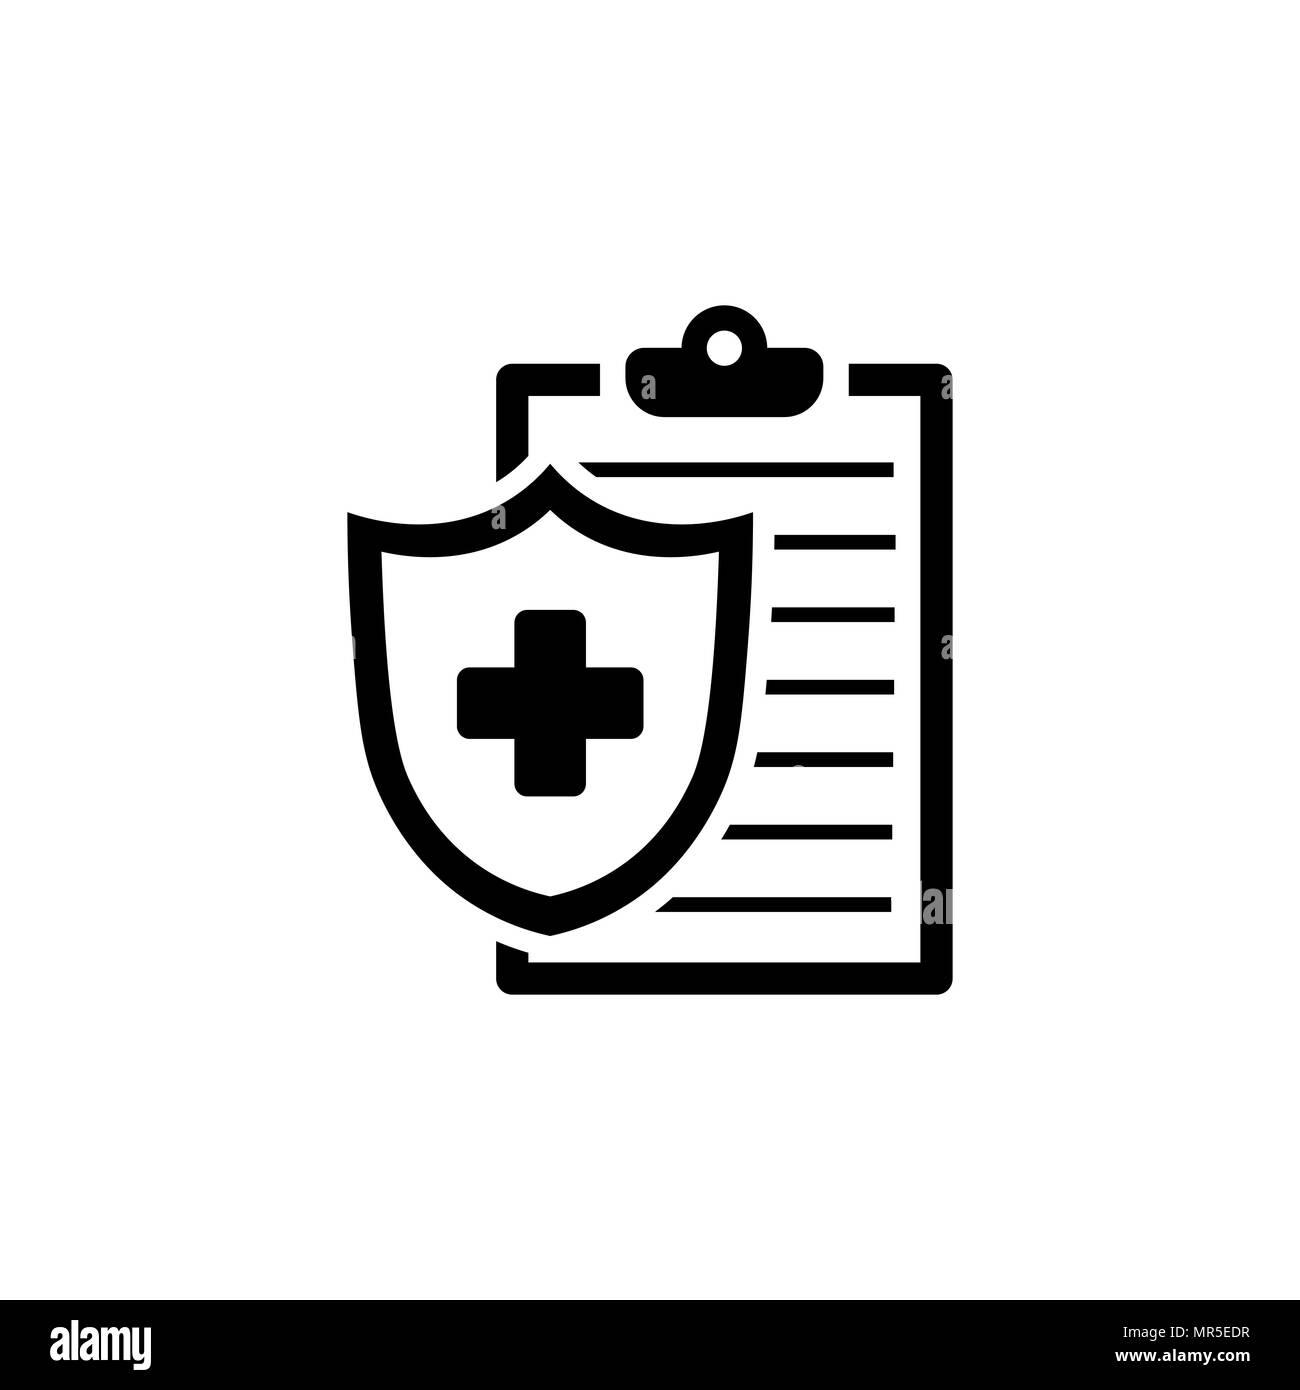 medical insurance icon health insurance symbol stock vector art